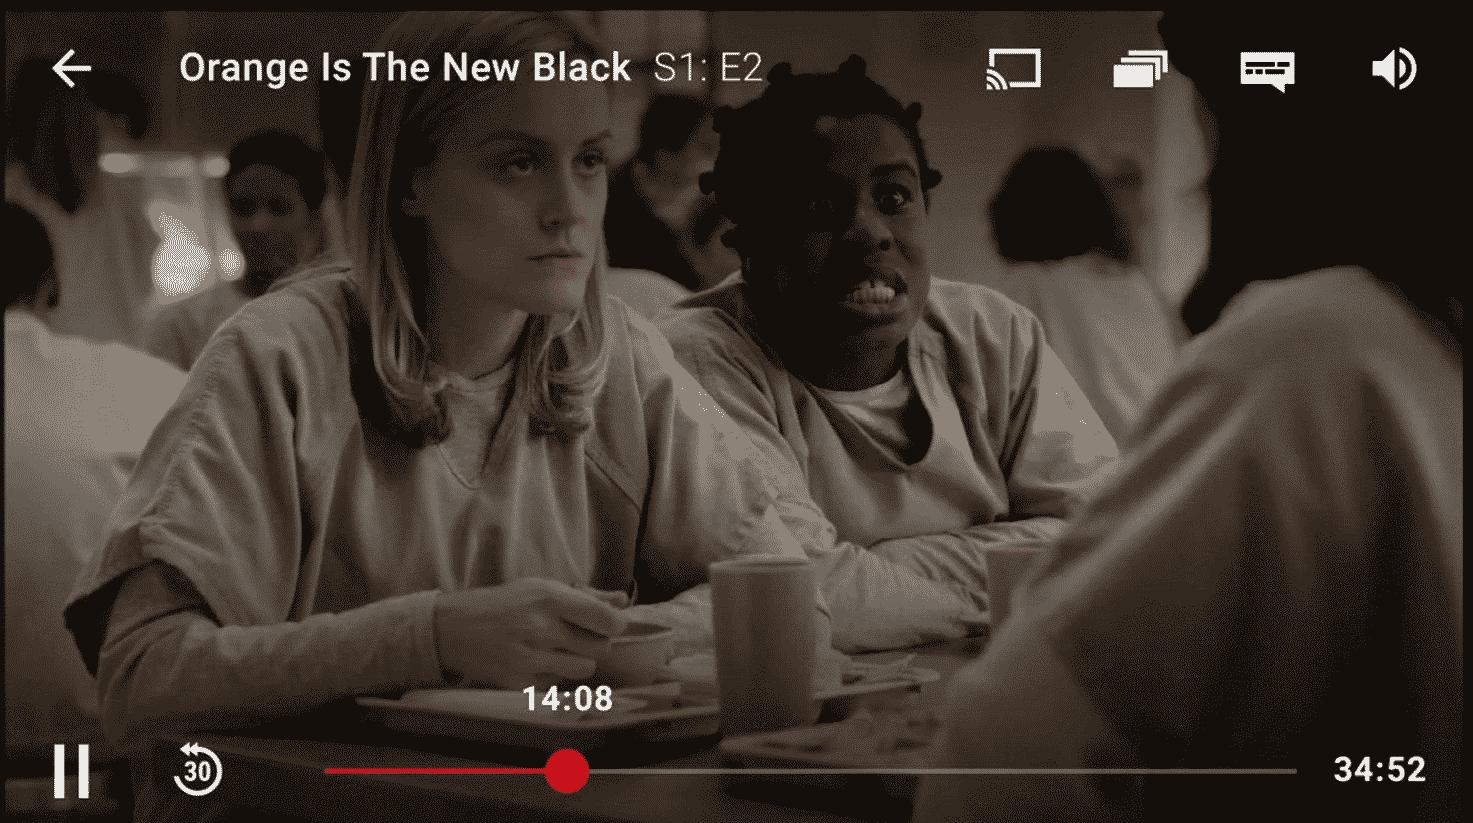 Unable to Cast Netflix To Chromecast - Chrome Story